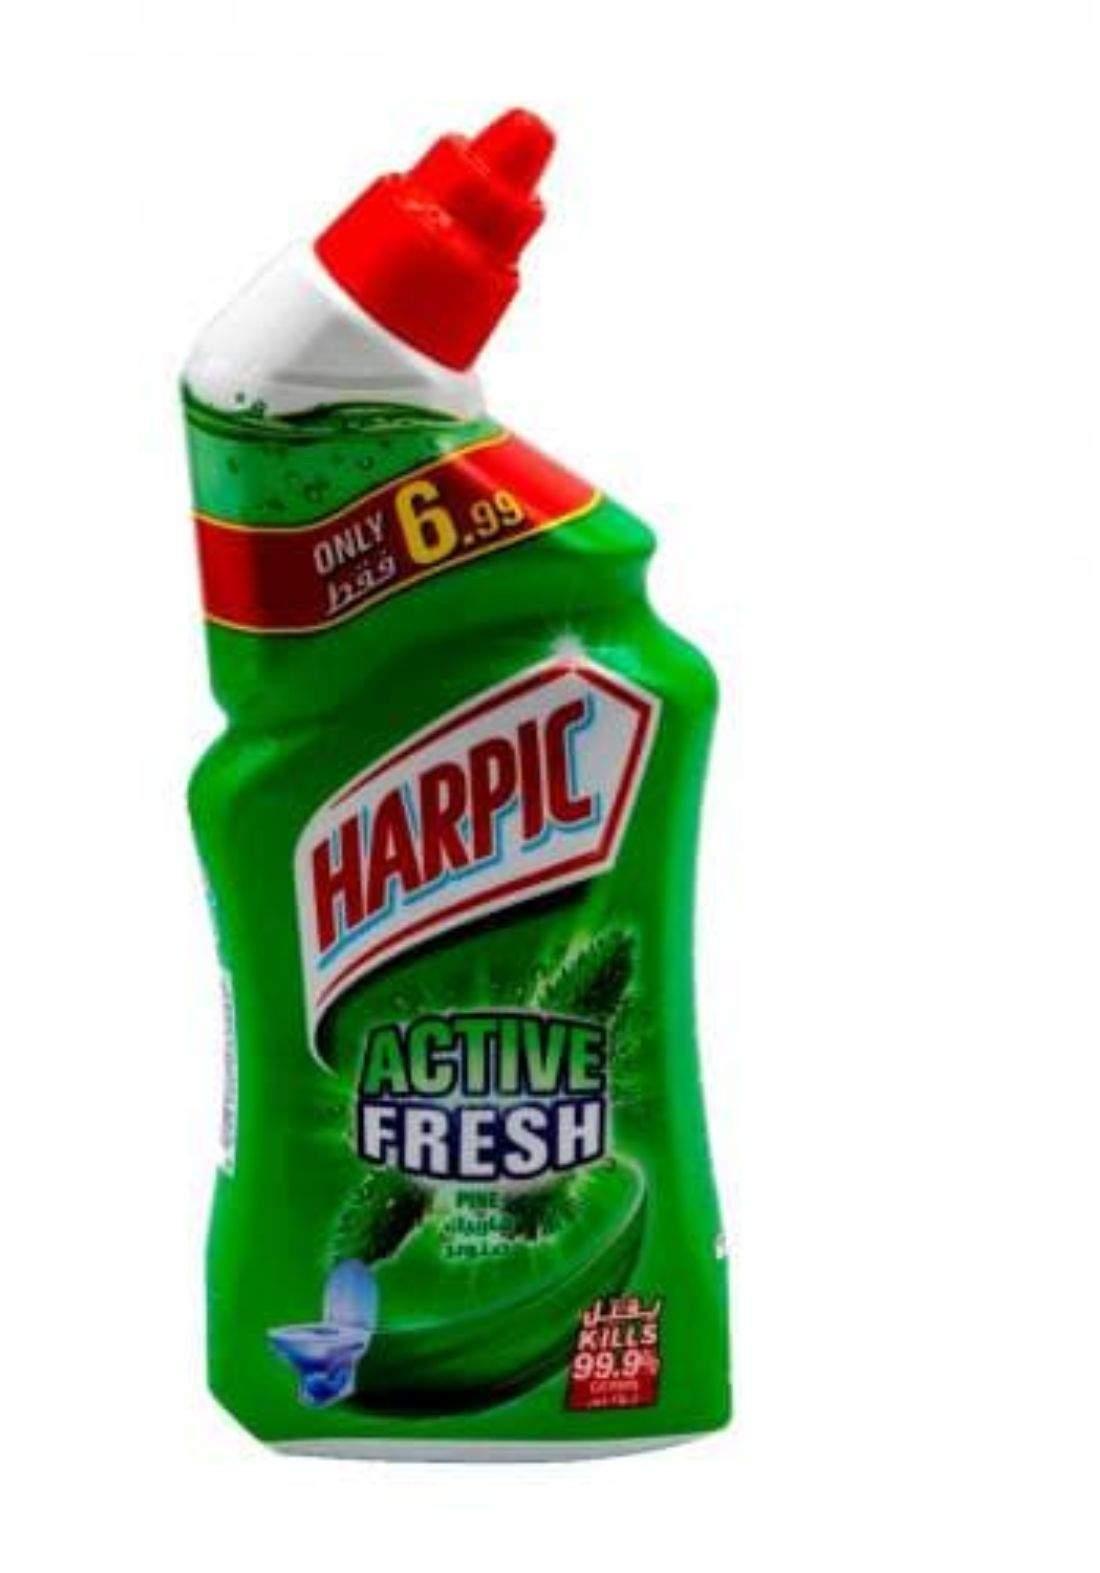 Harpic active fresh 495ml هاربيك اكتف فريش